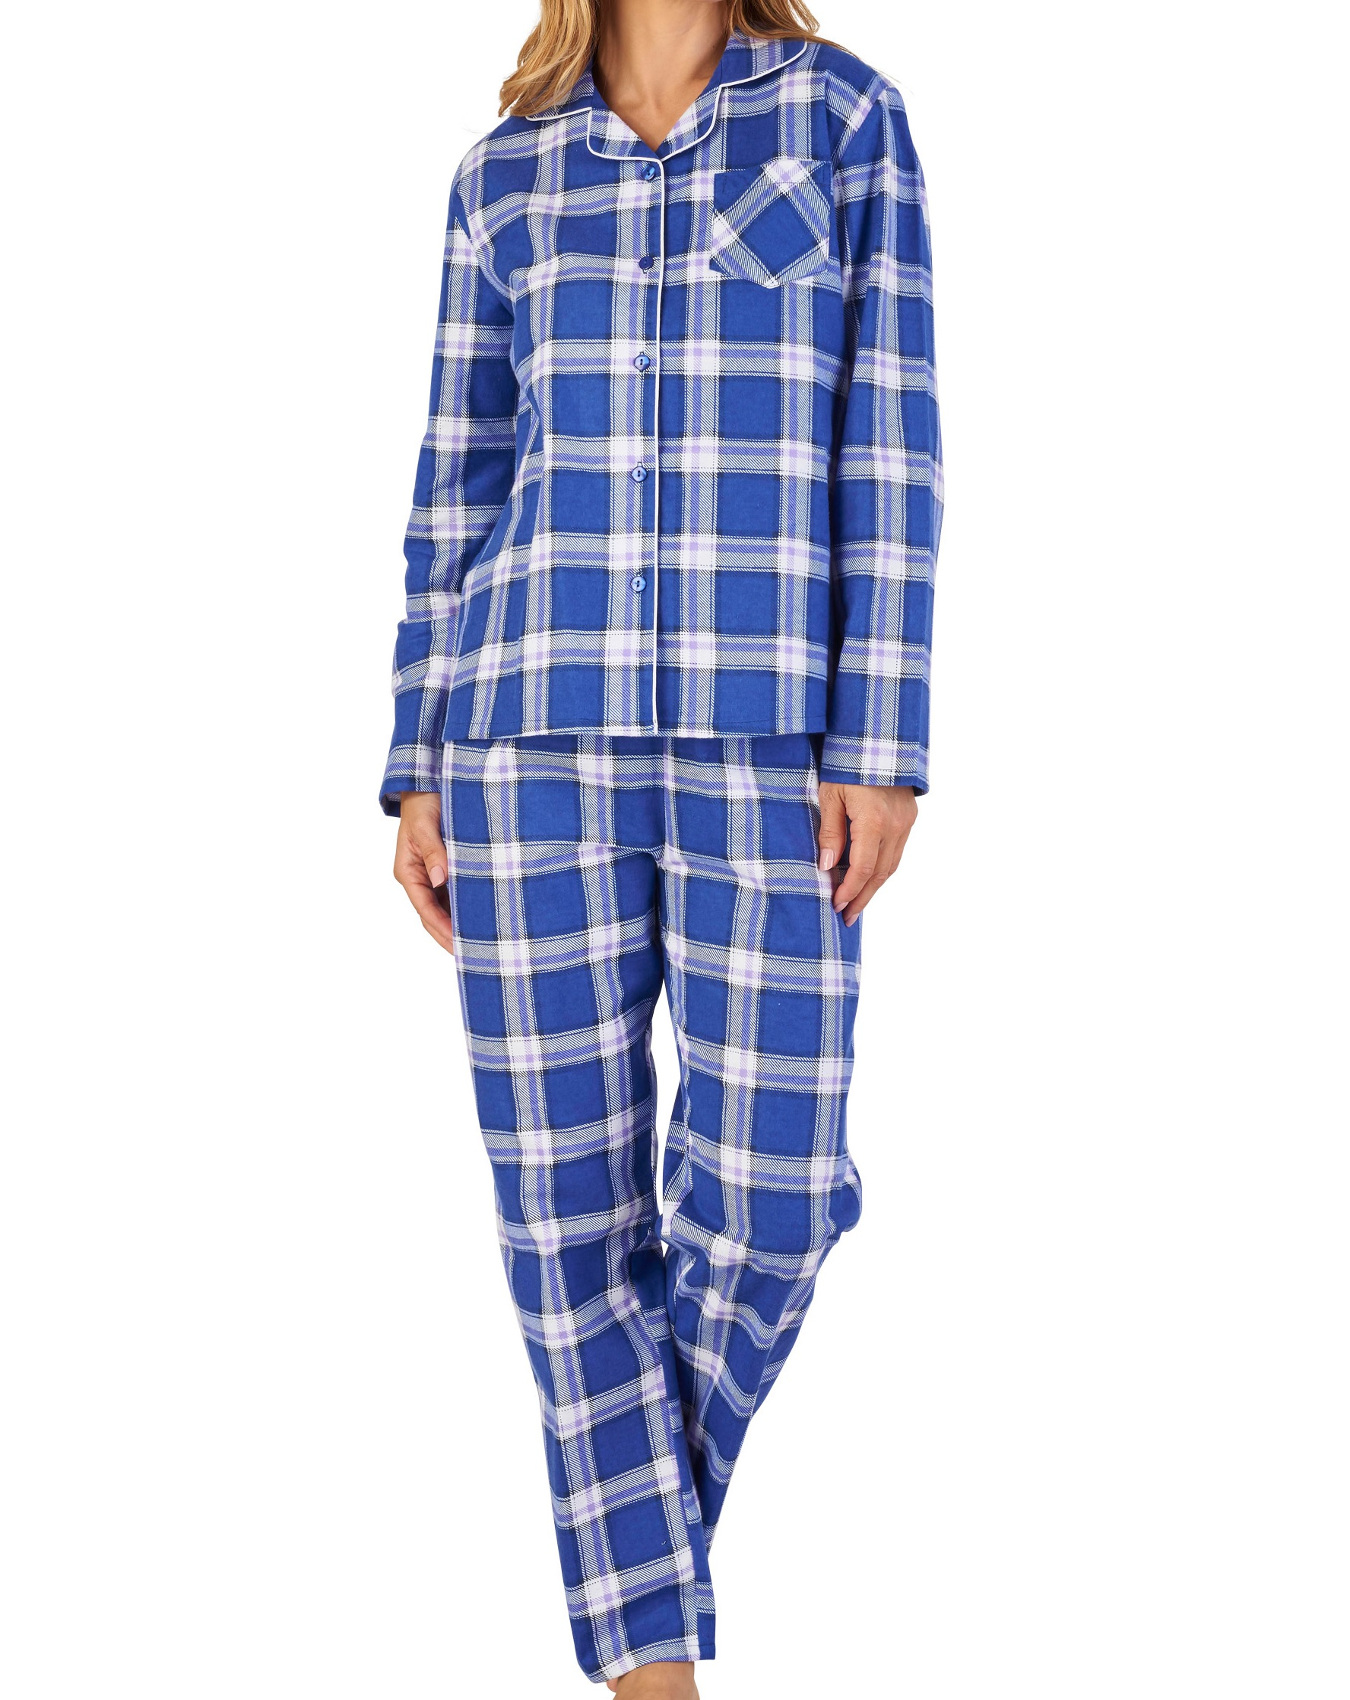 Pyjamas Womens Slenderella Soft Flannel Cotton PJs Set ...